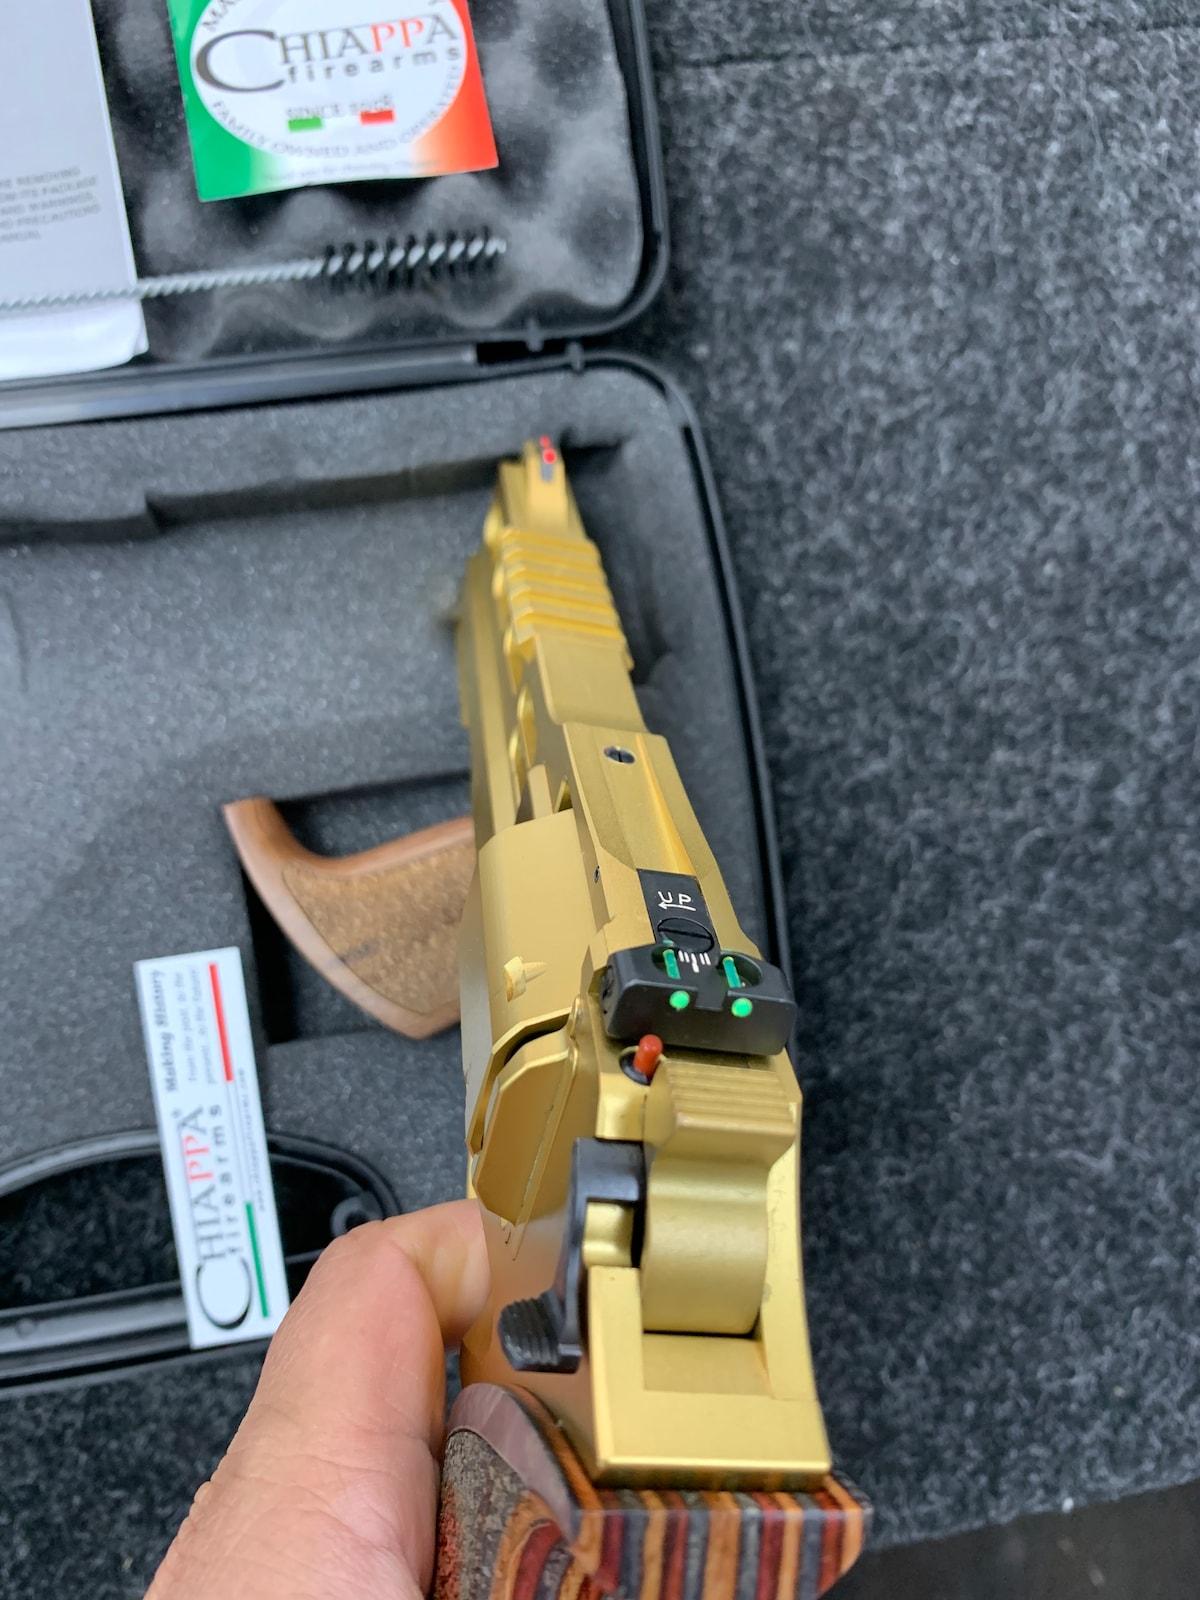 CHIAPPA FIREARMS rhino 60ds gold 357 magnum